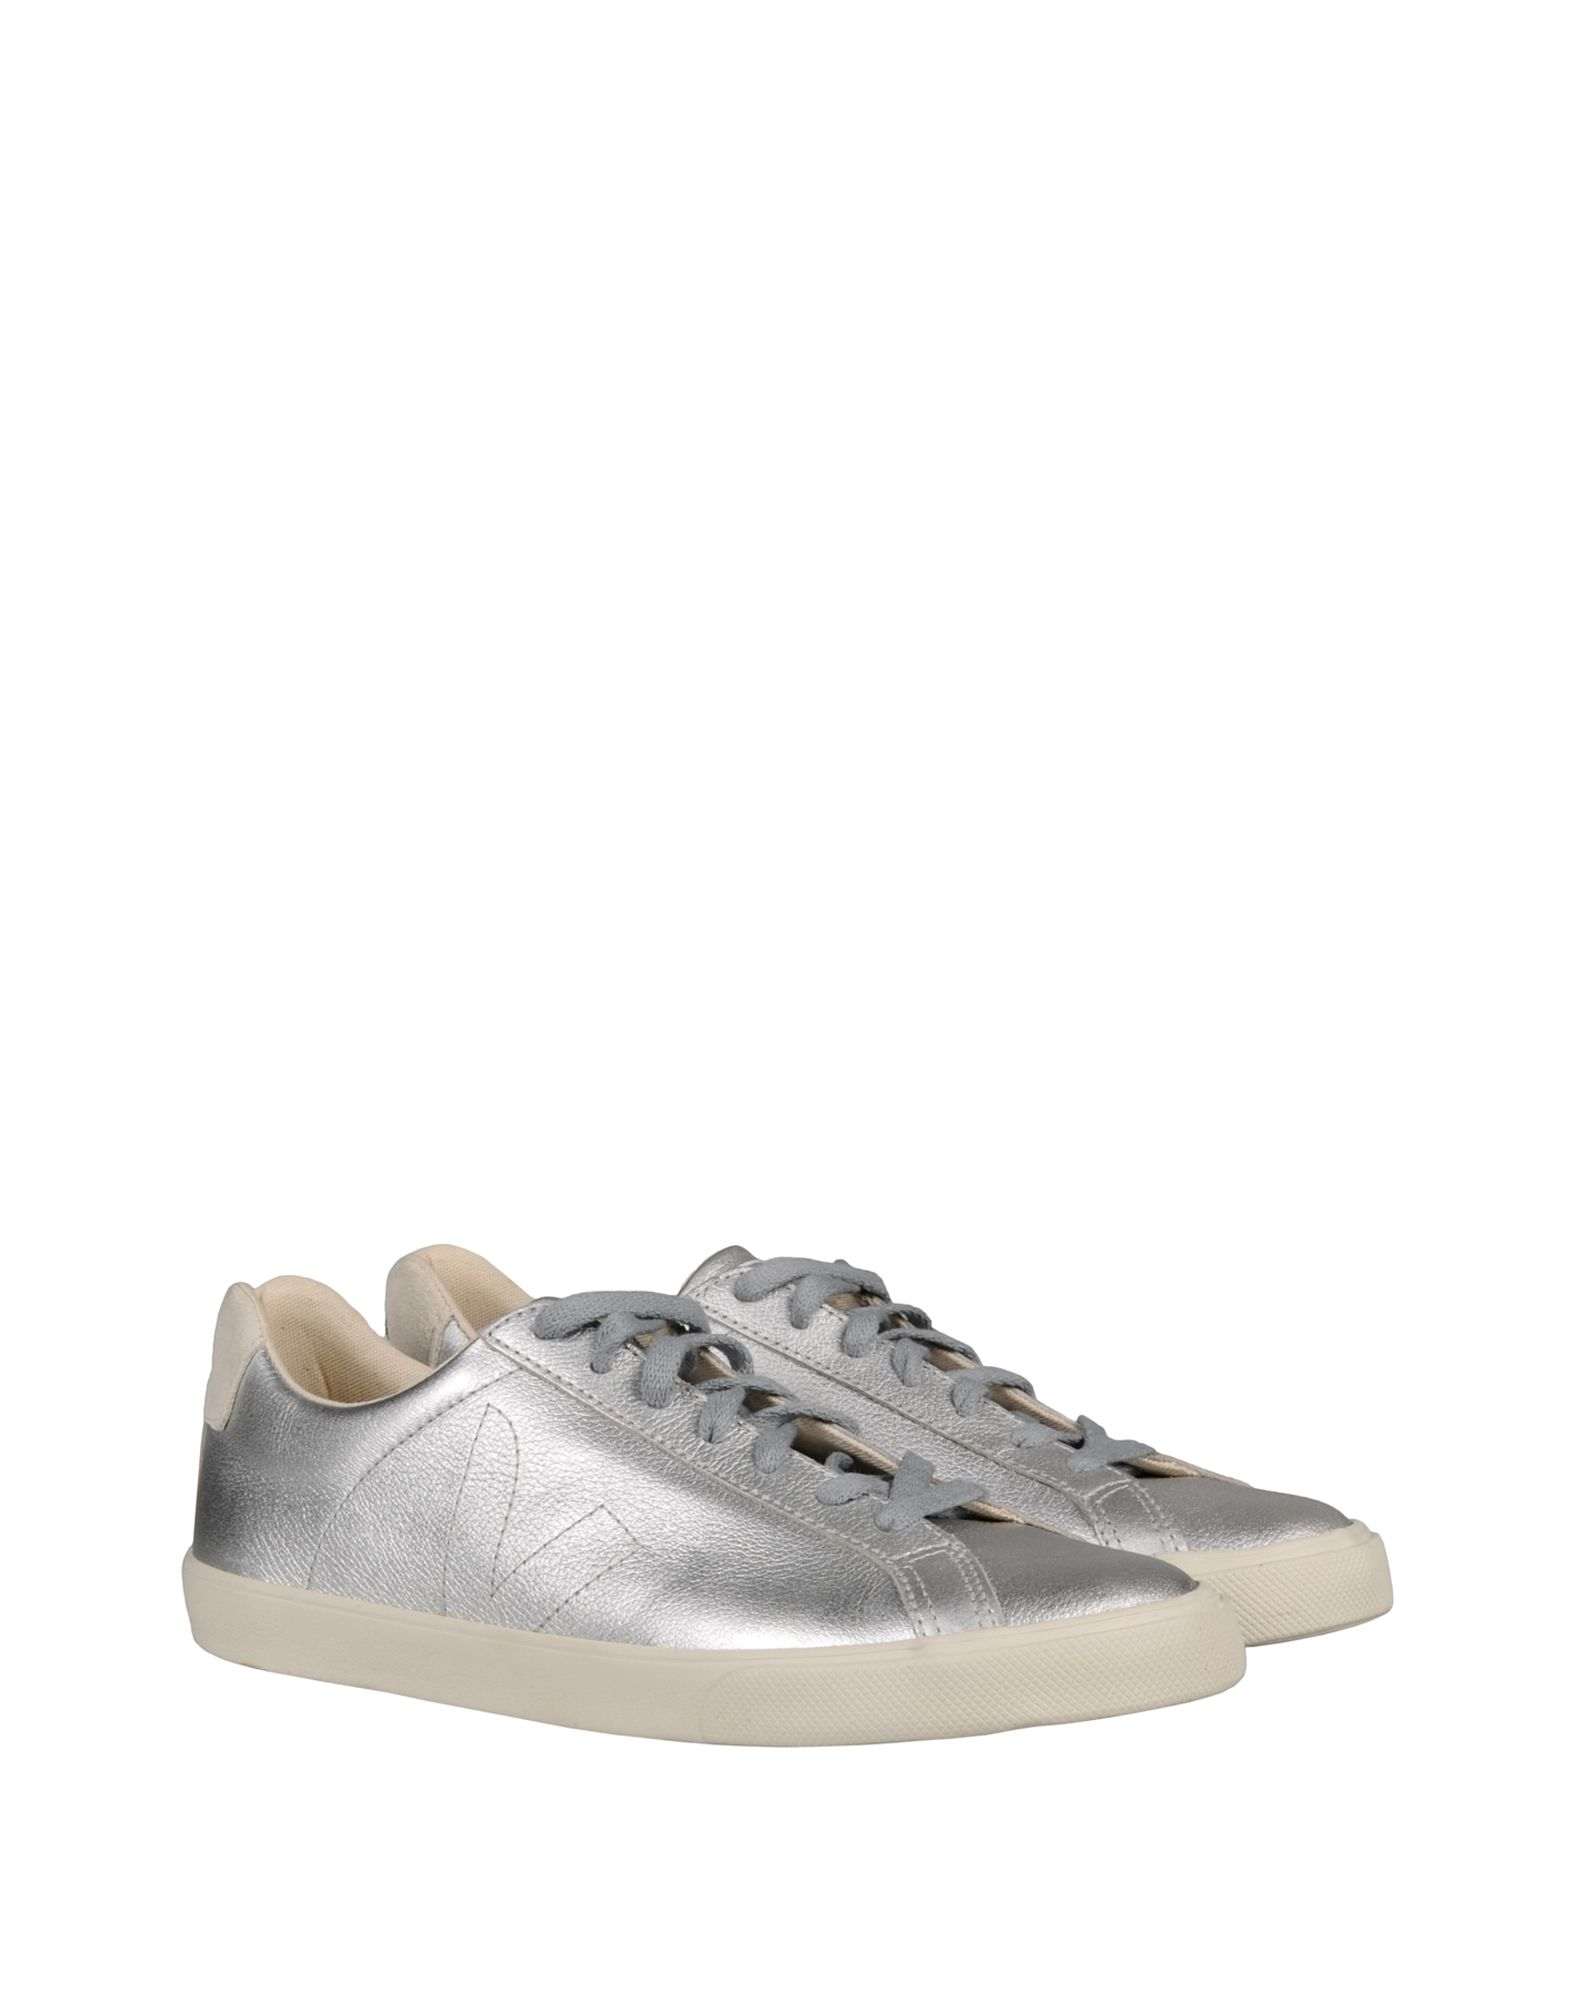 Veja Sneakers Damen  11000995MA Gute Qualität Schuhe beliebte Schuhe Qualität ae0128